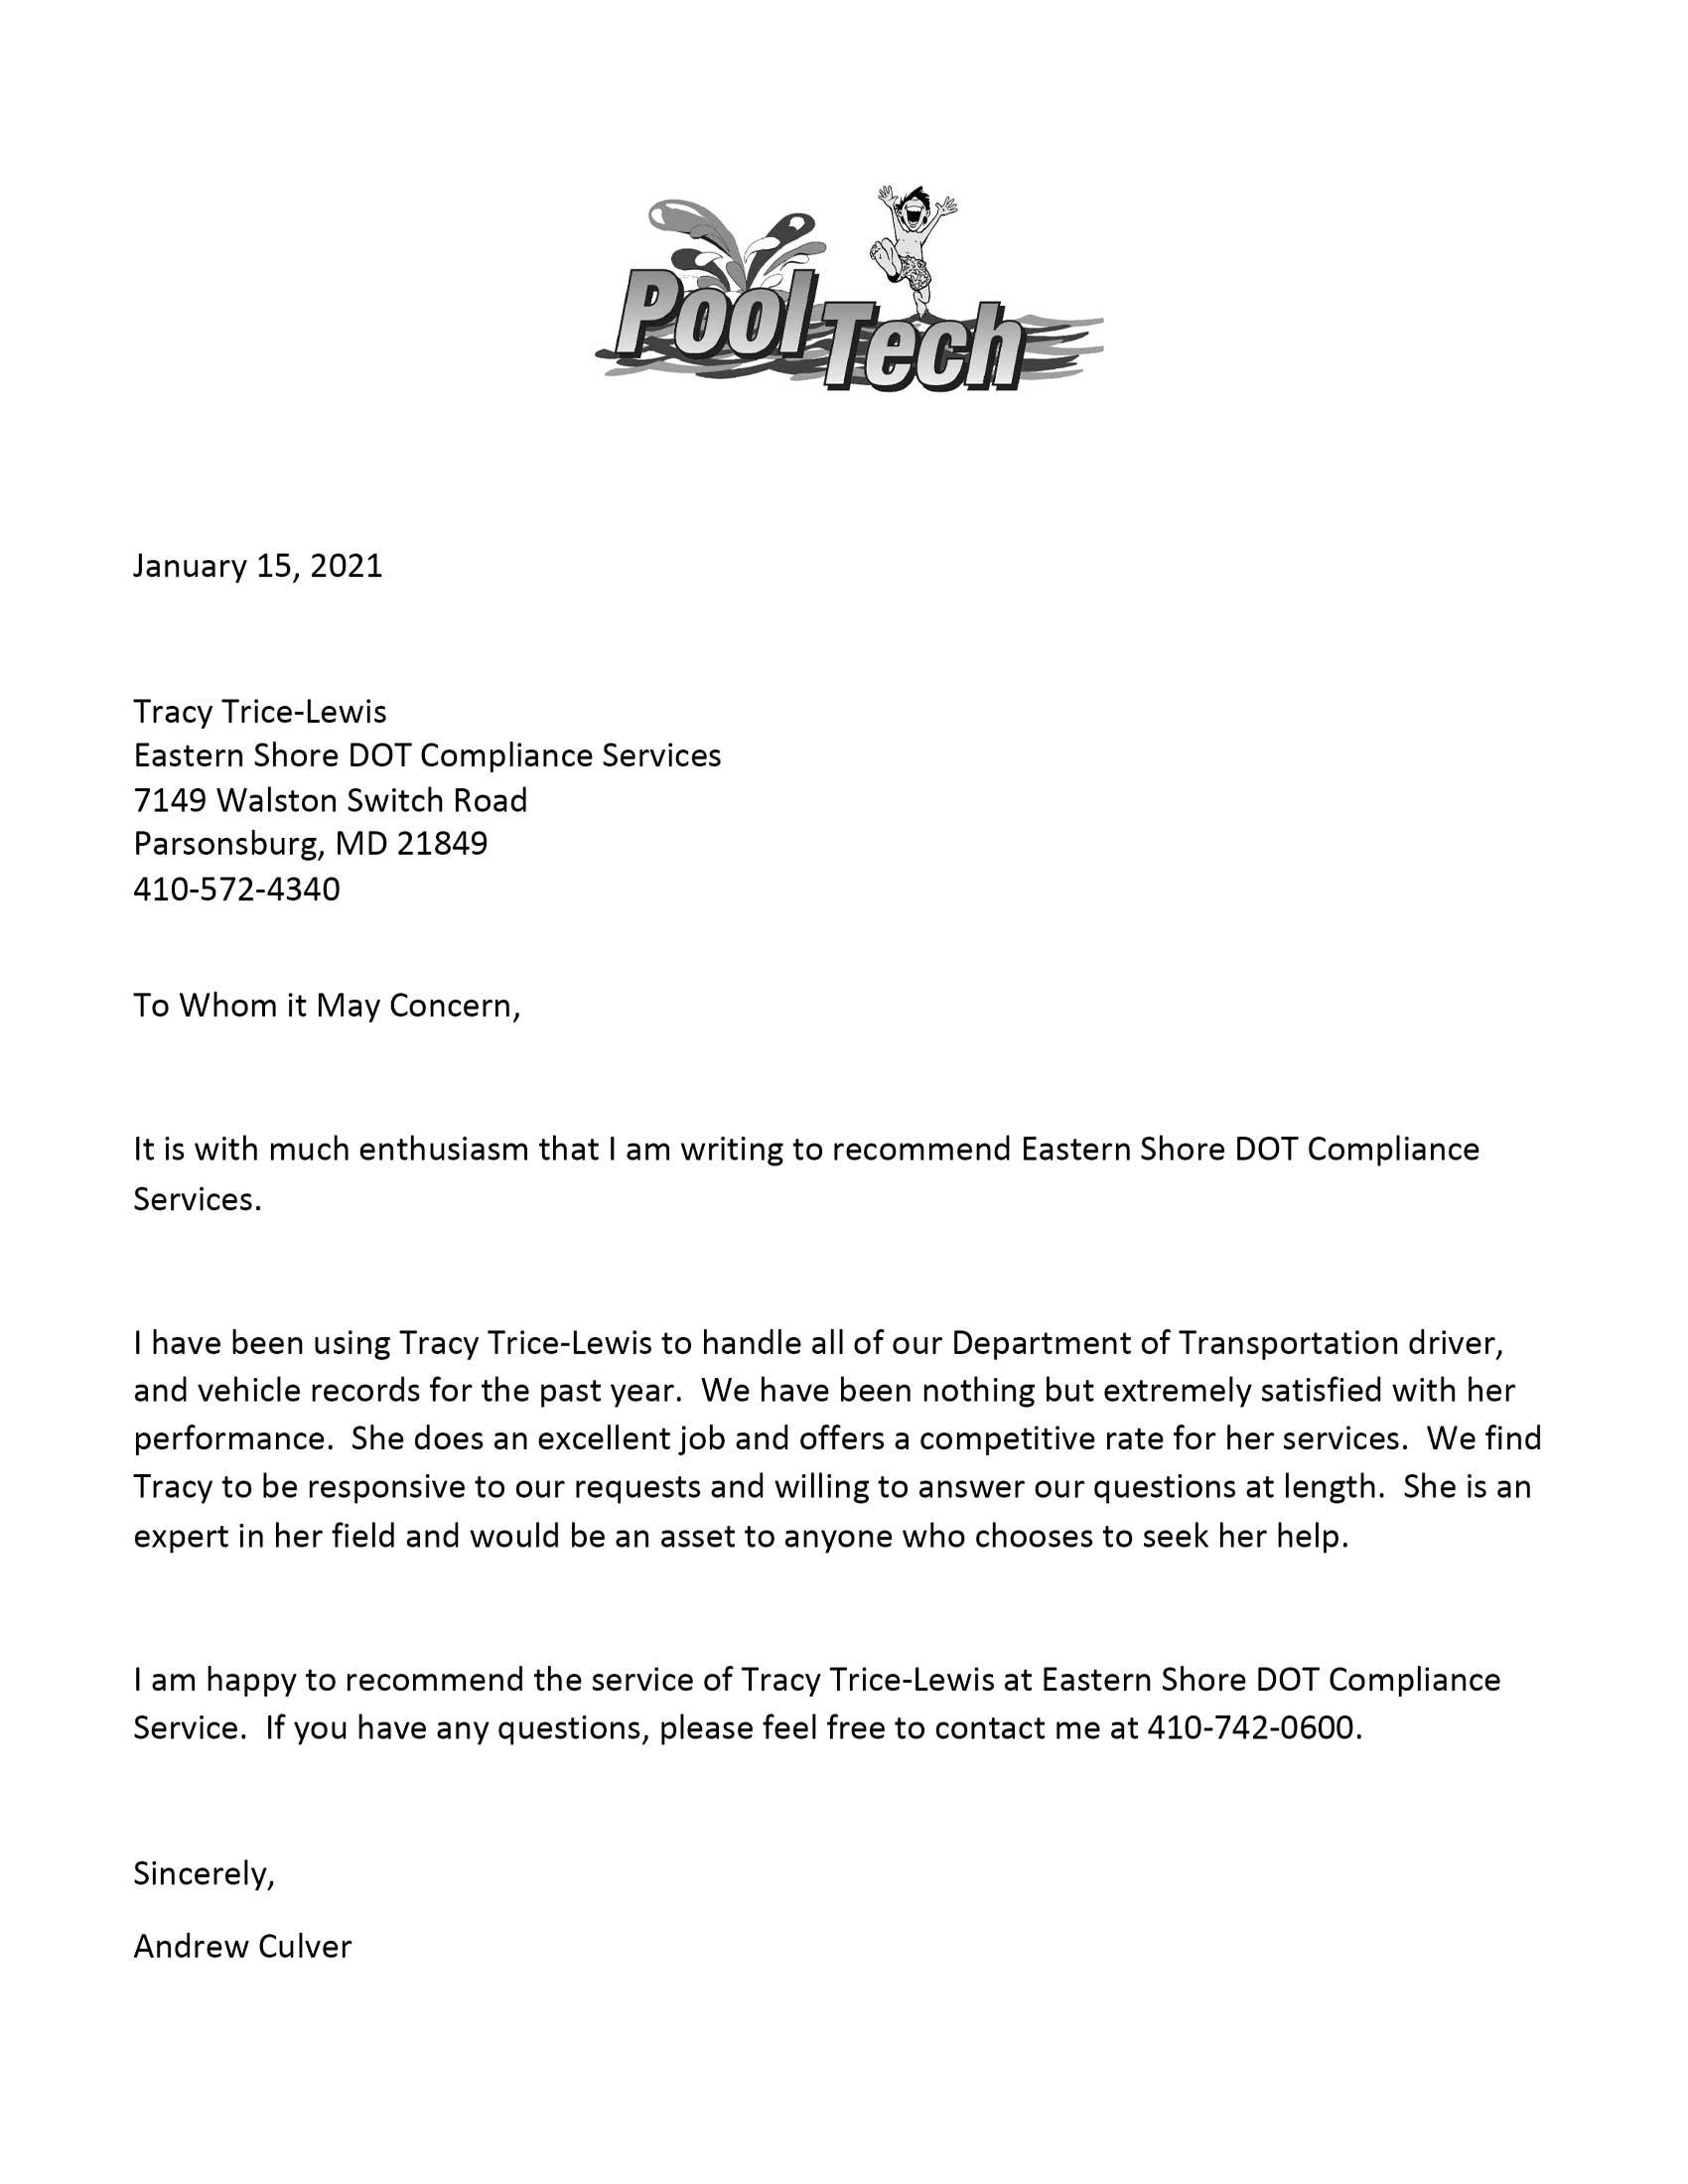 Pooltech Recommendation letter